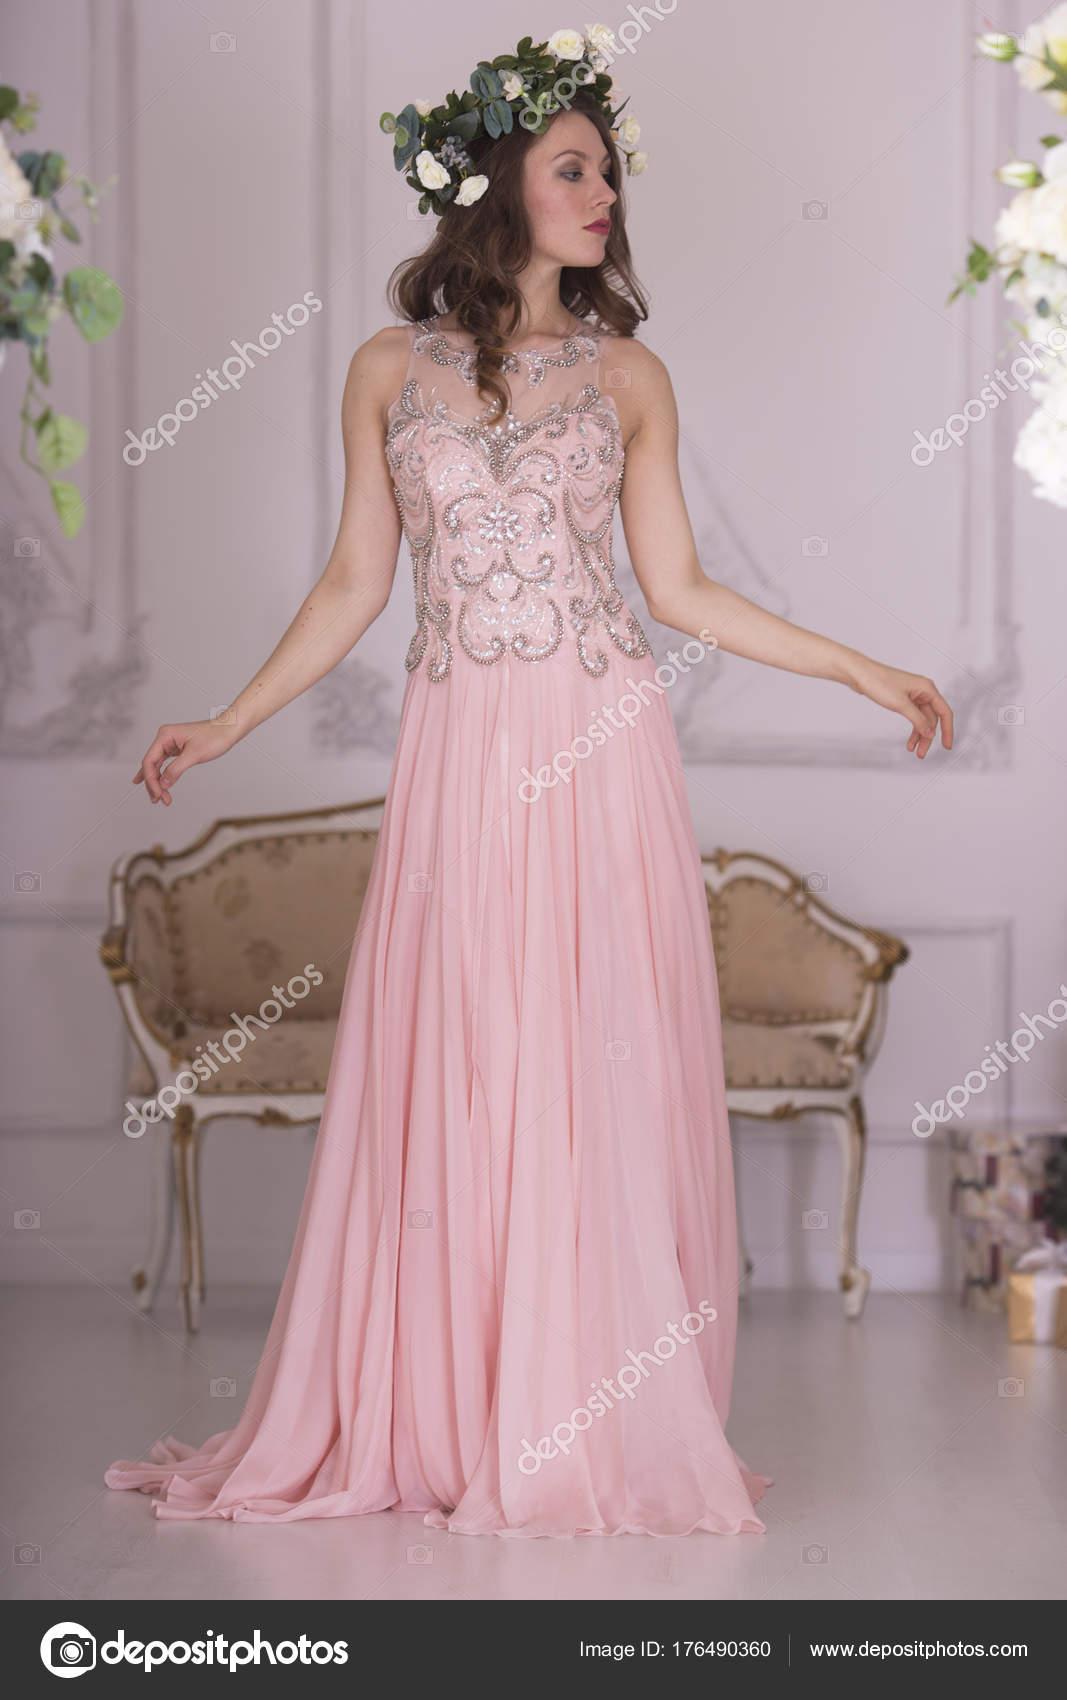 Retrato Muchacha Vestido Rosa — Foto de stock © igorlitvyak #176490360